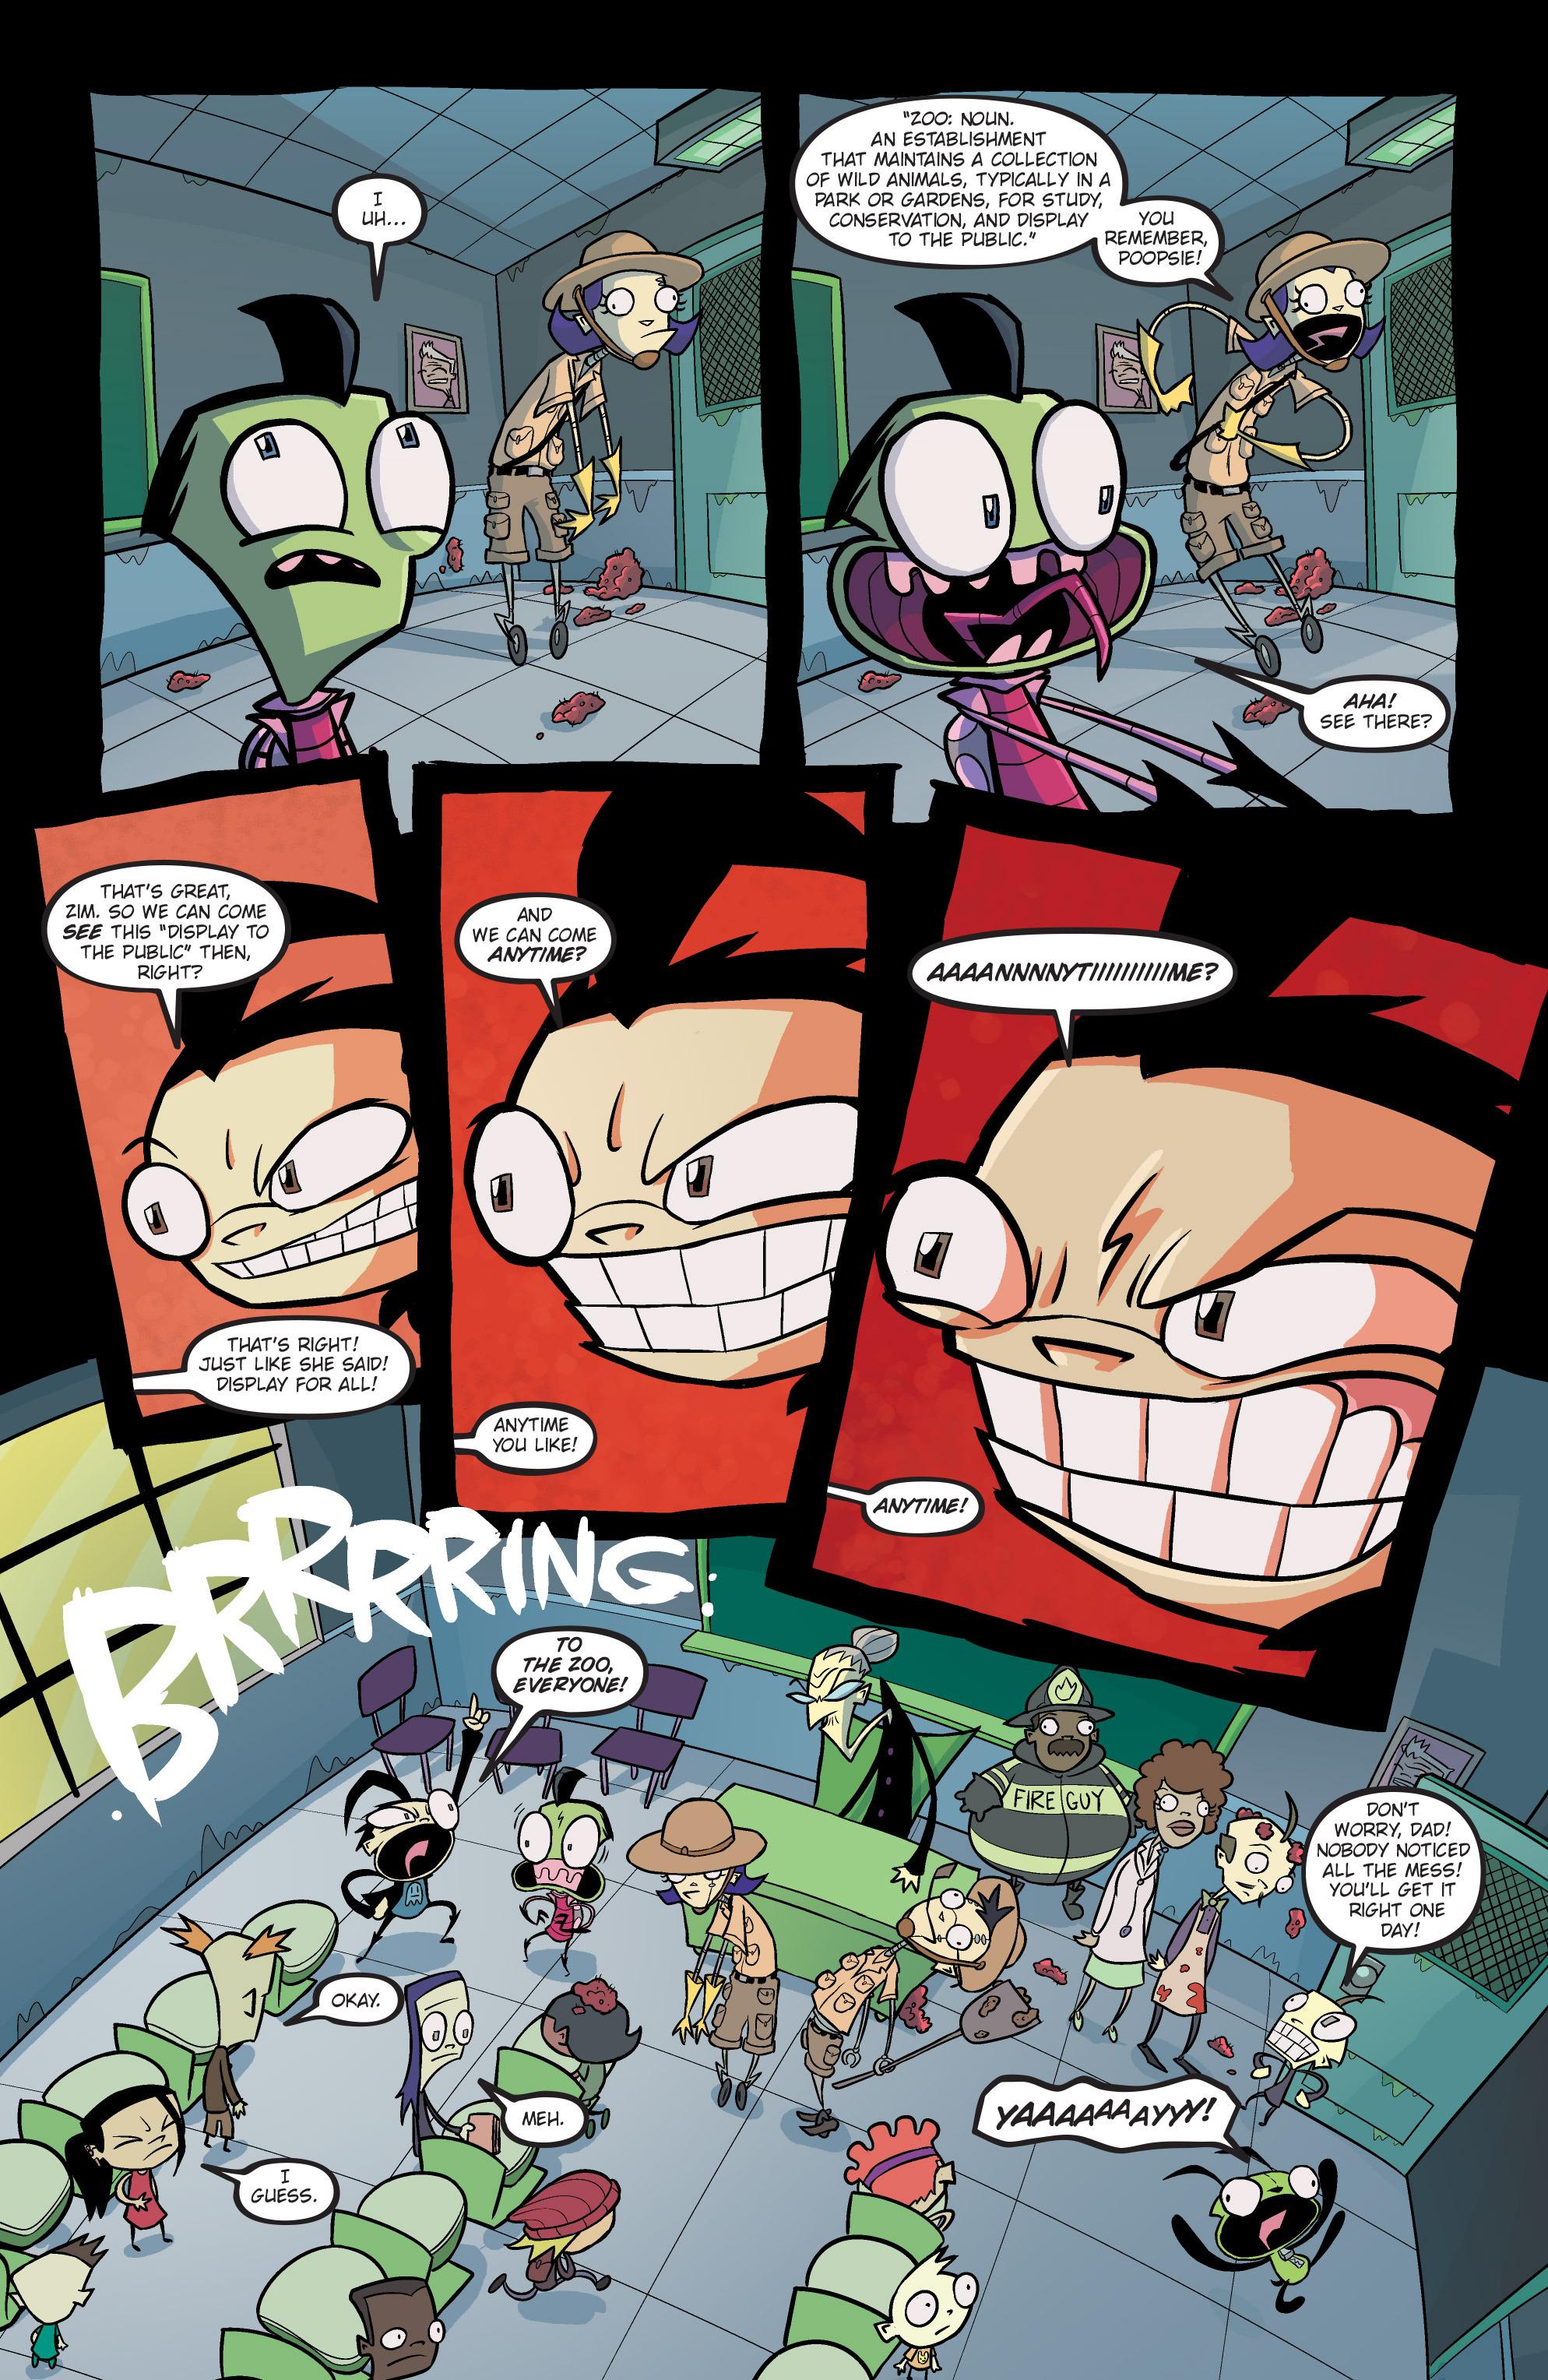 Read online Invader Zim comic -  Issue #19 - 5